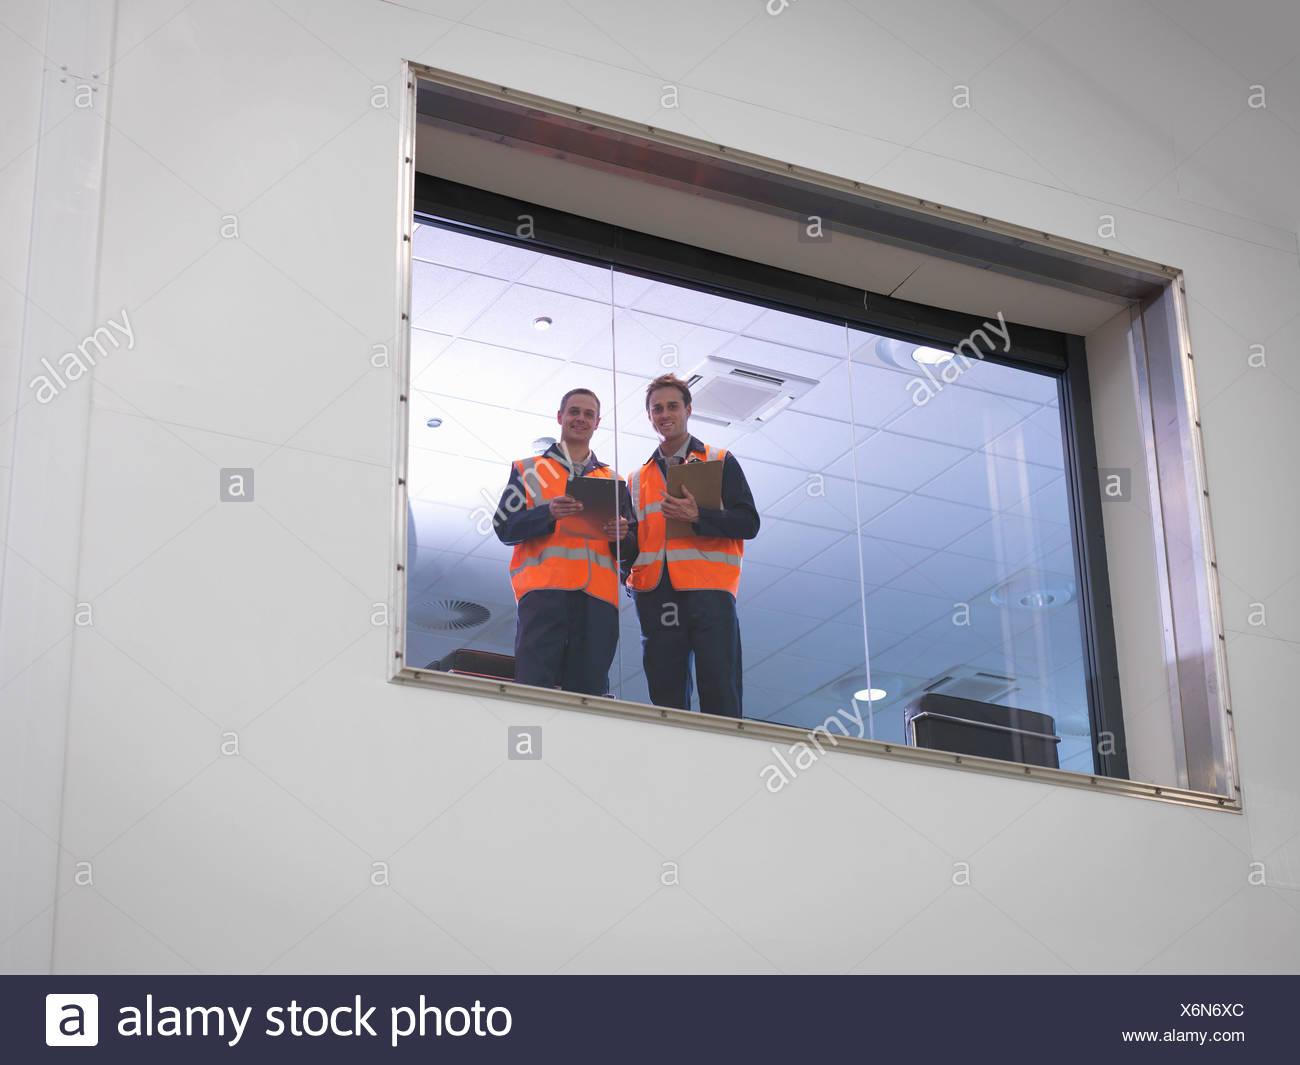 Engineers look out of window in hangar - Stock Image